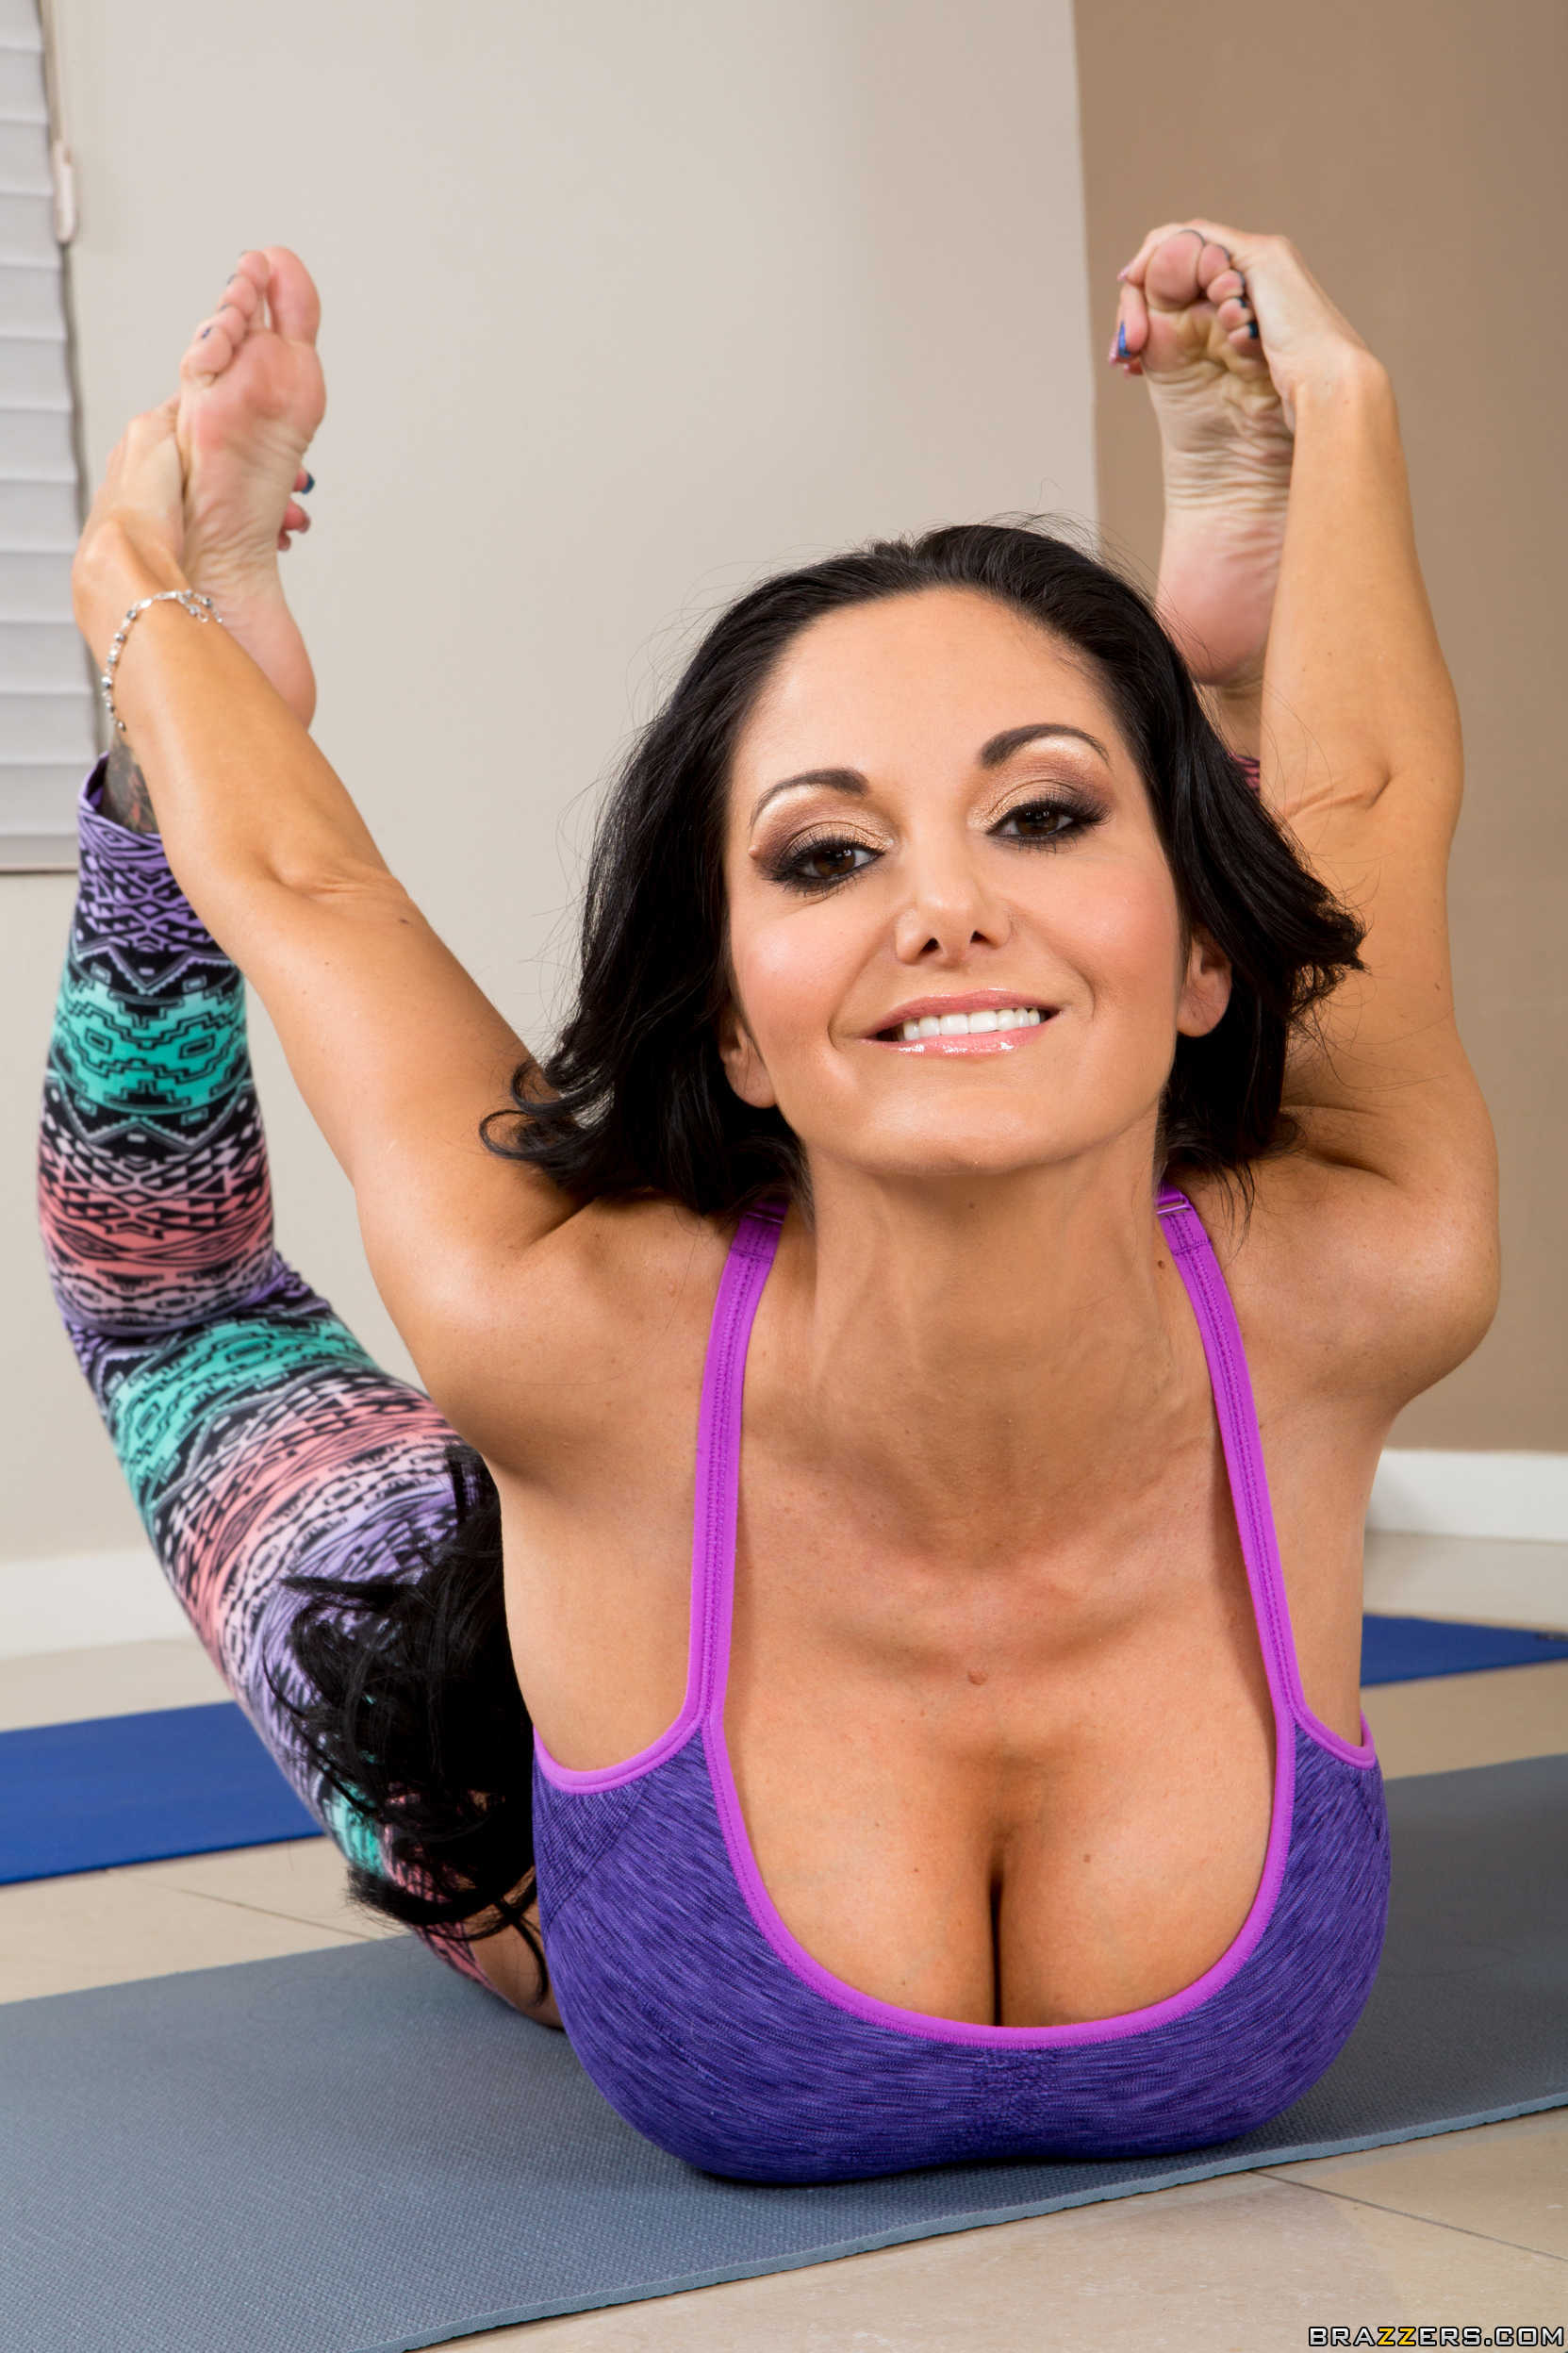 Ava addams yoga